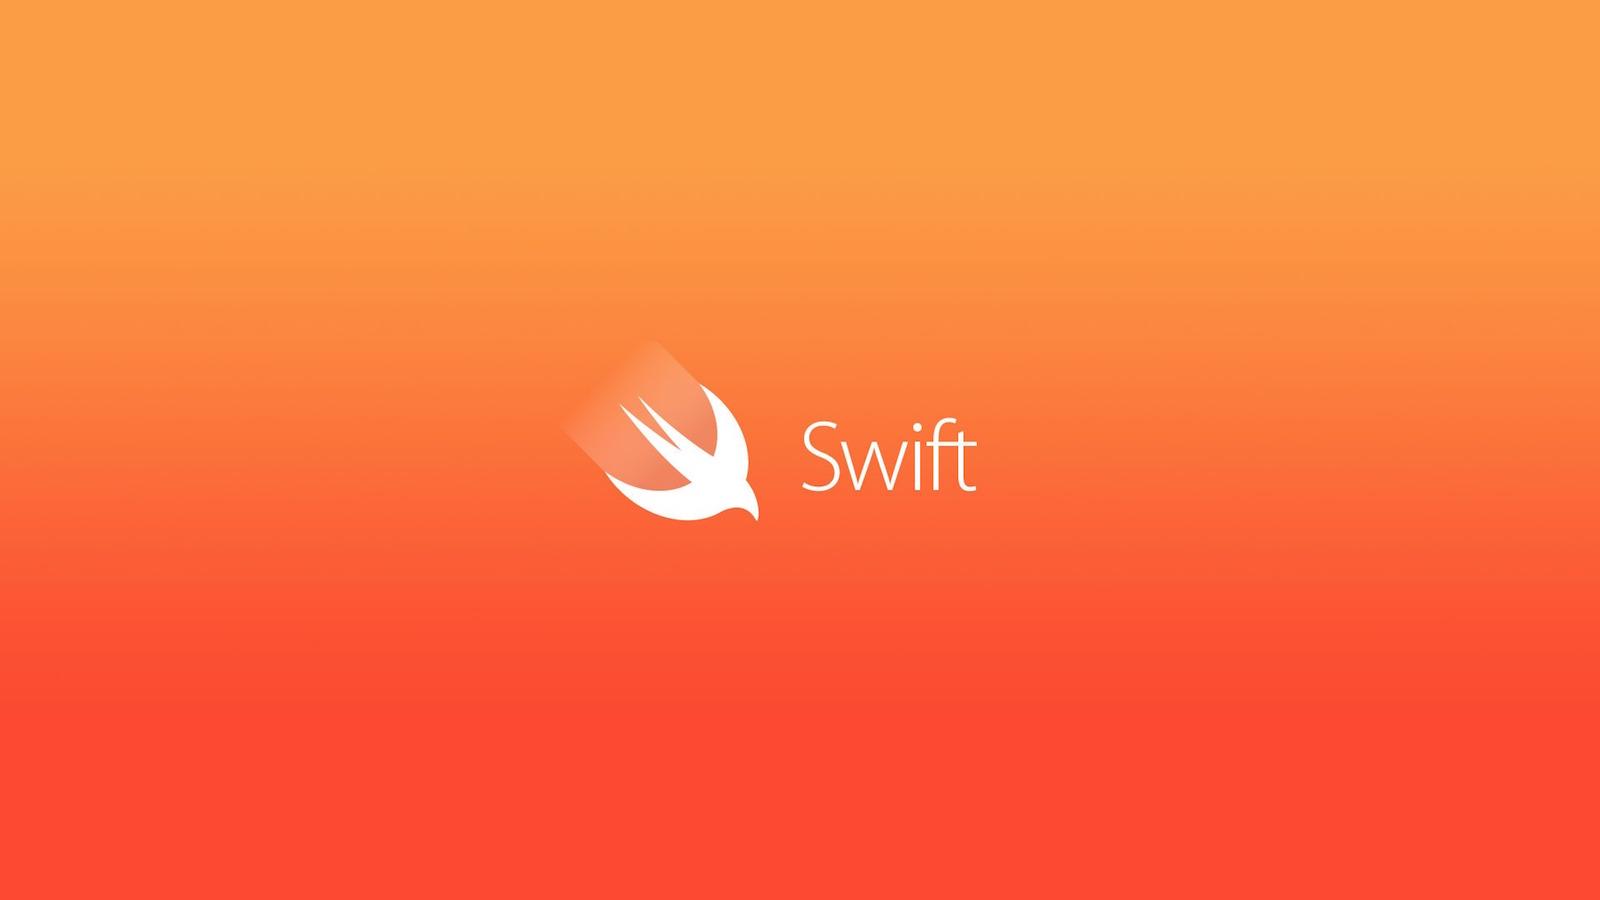 Introduction to Swift for Ubuntu